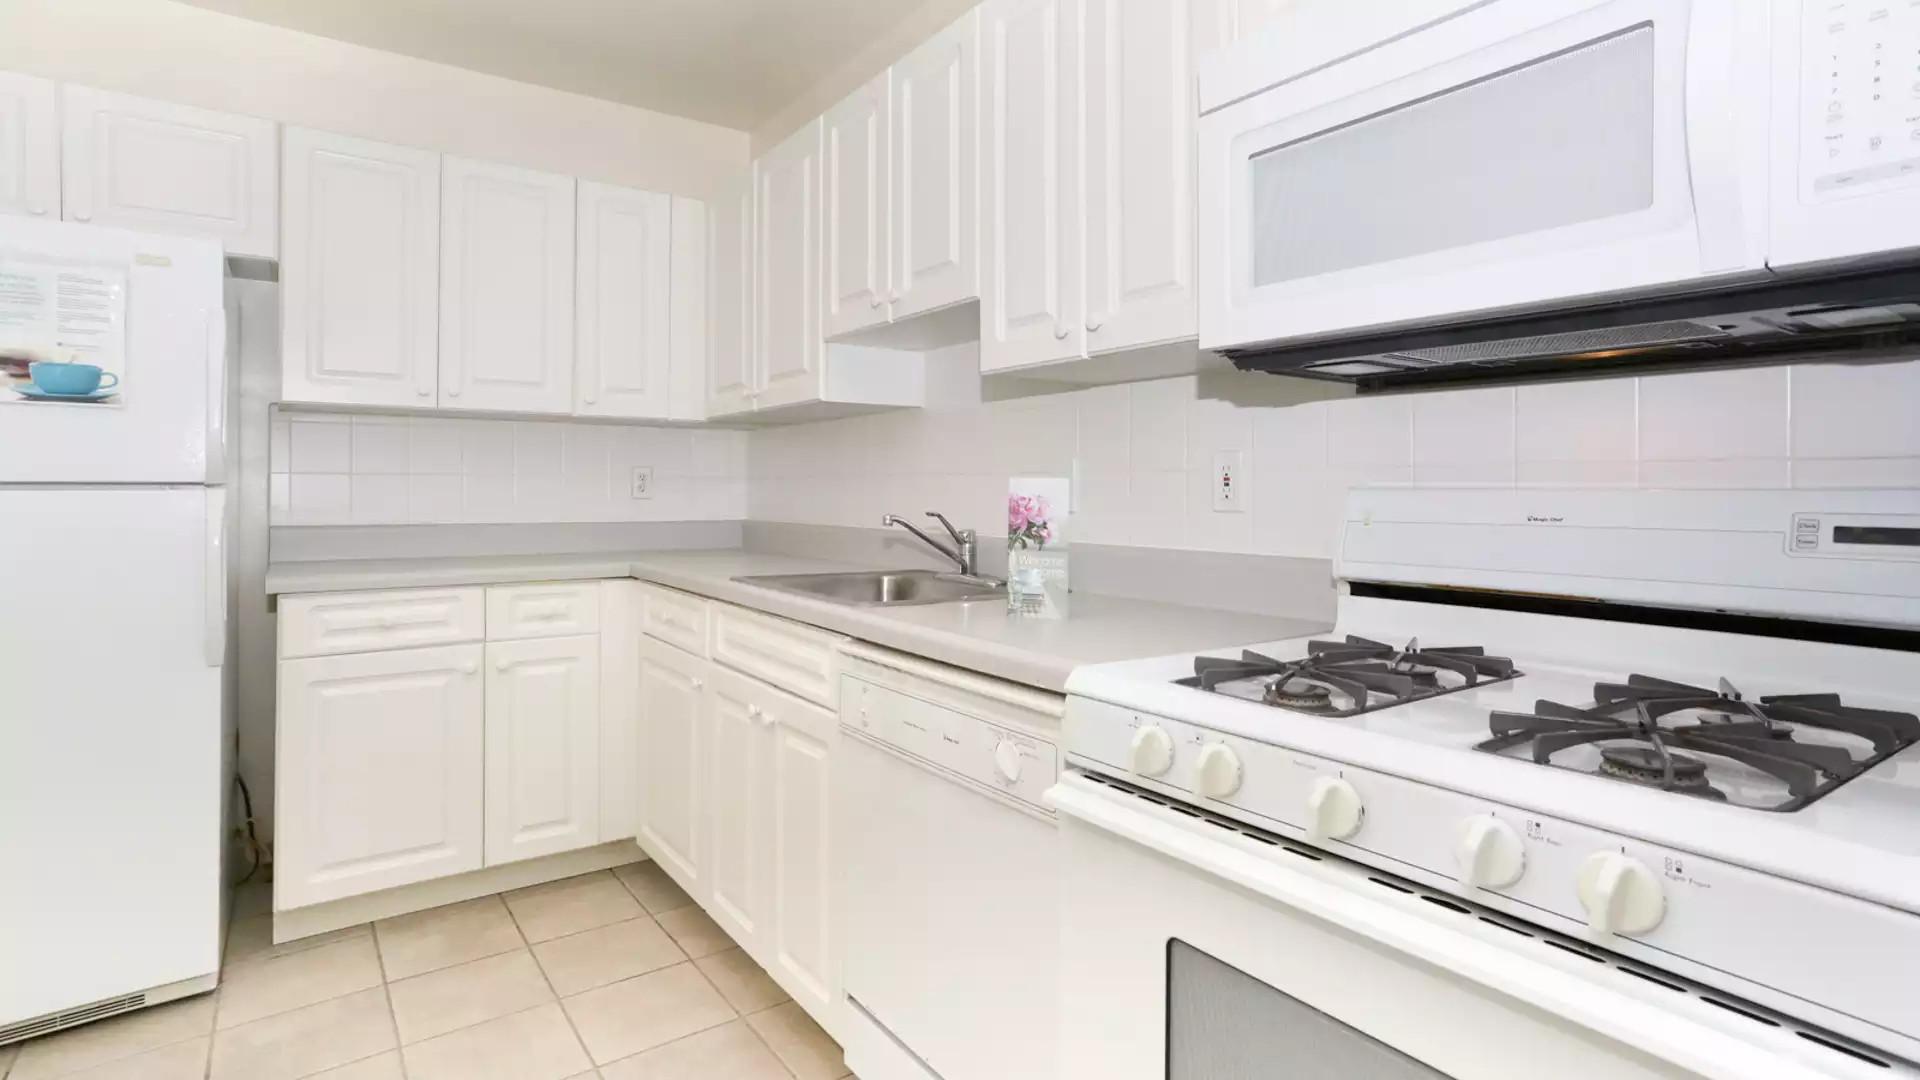 3003 Van Ness Apartments - Washington, DC